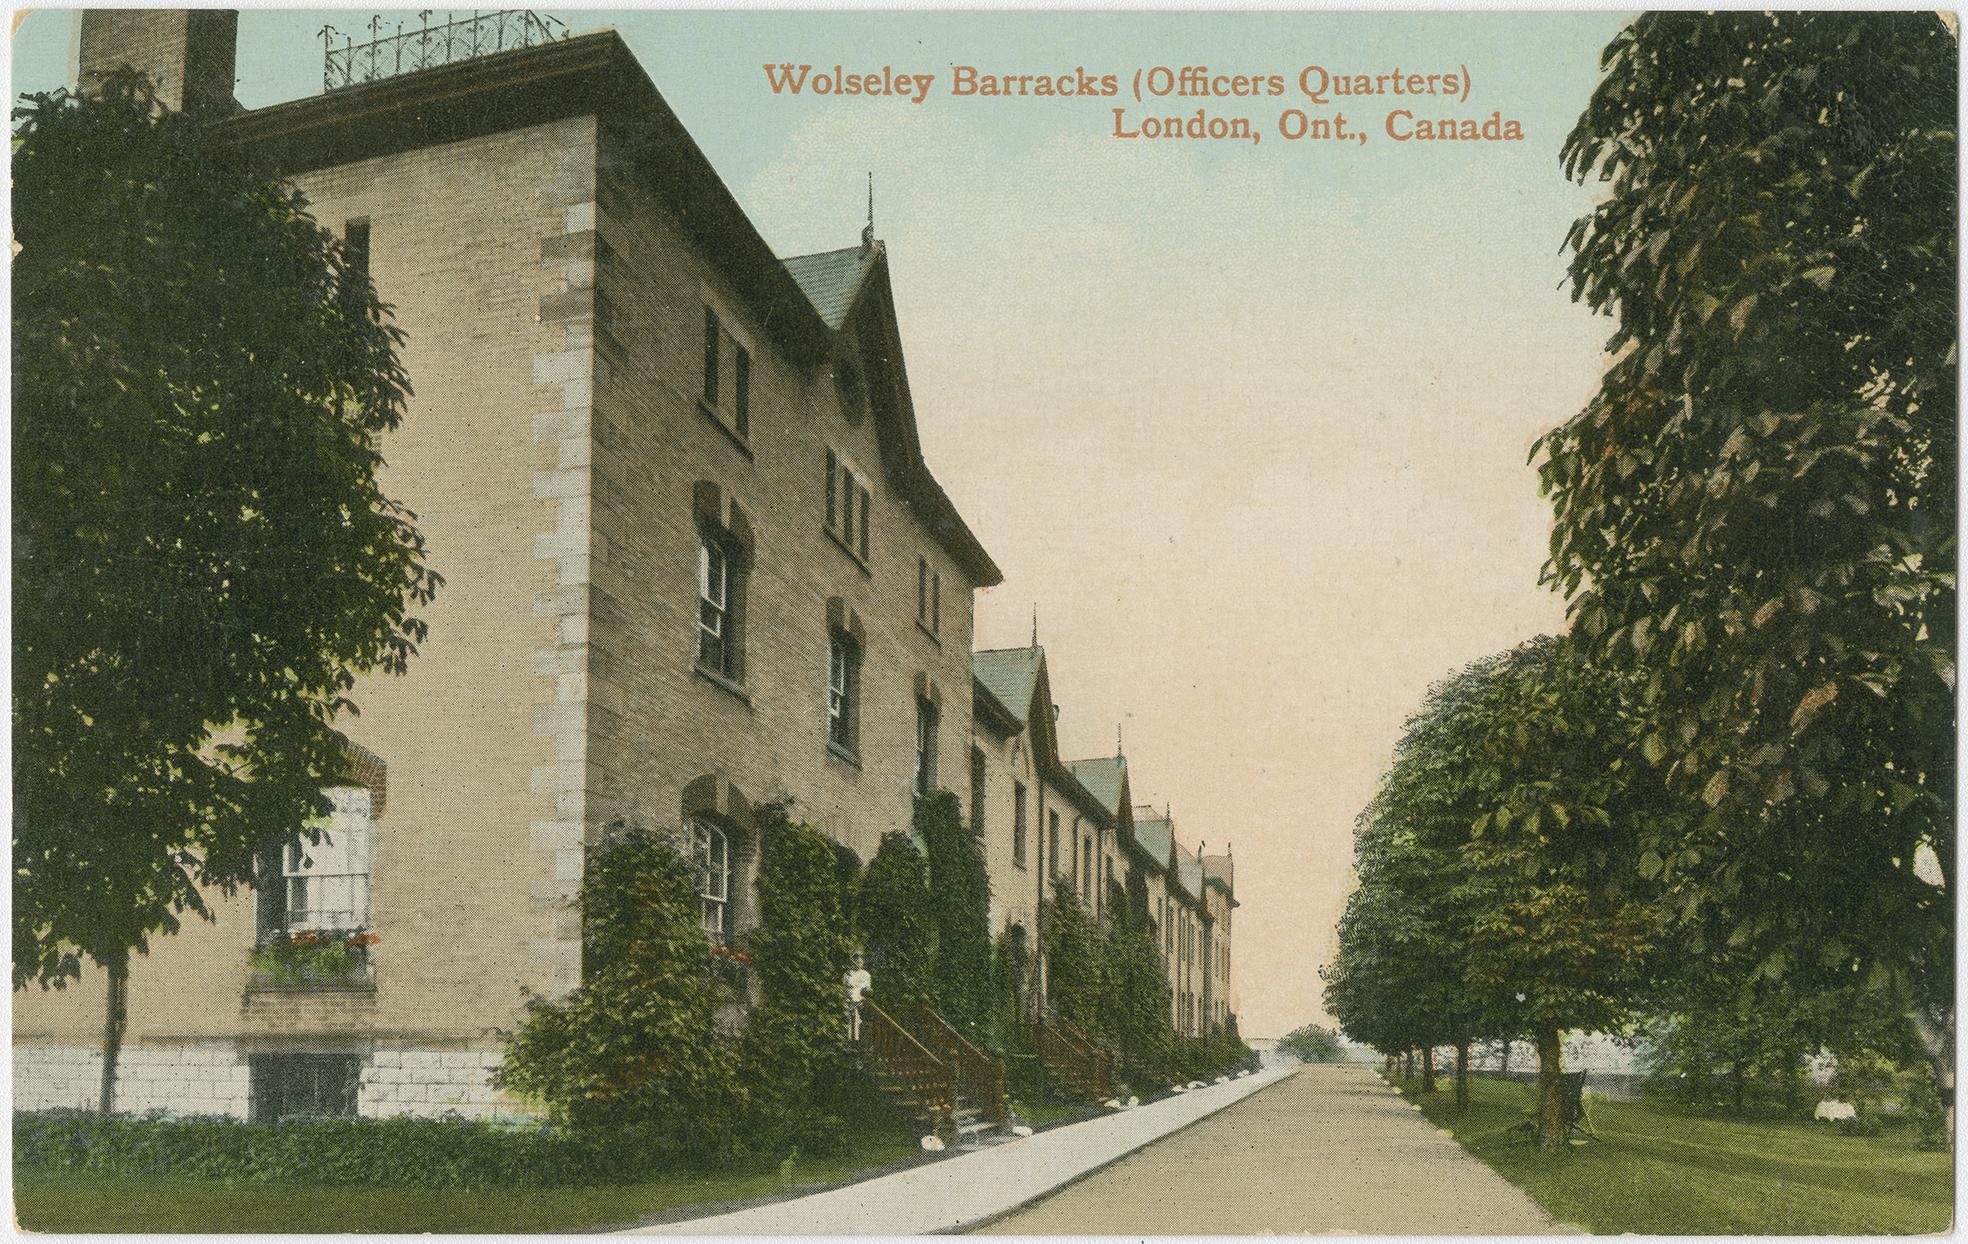 Wolseley Barracks, Officers Quarters, London Ont, Canada